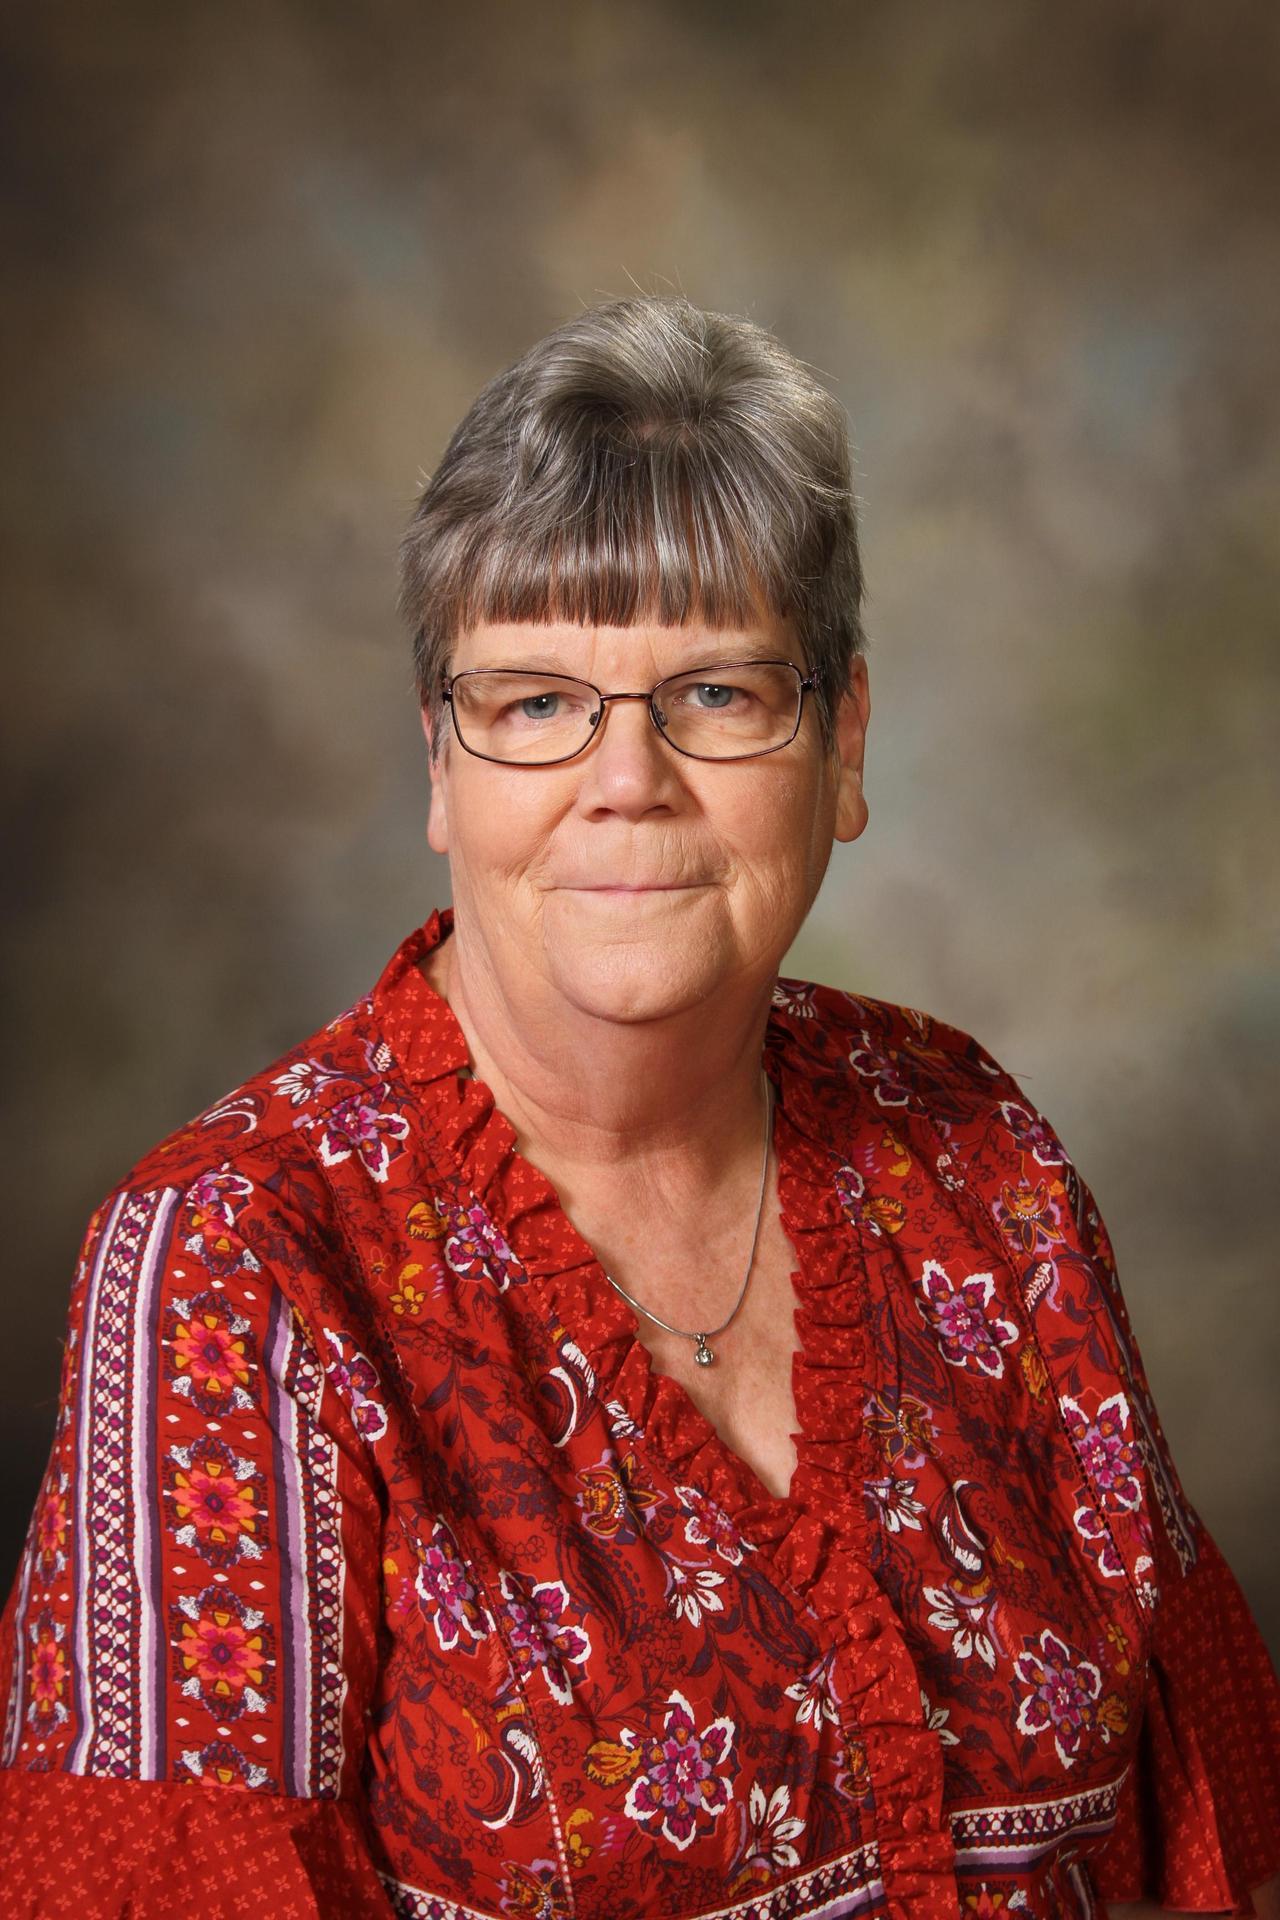 Ms. Harris